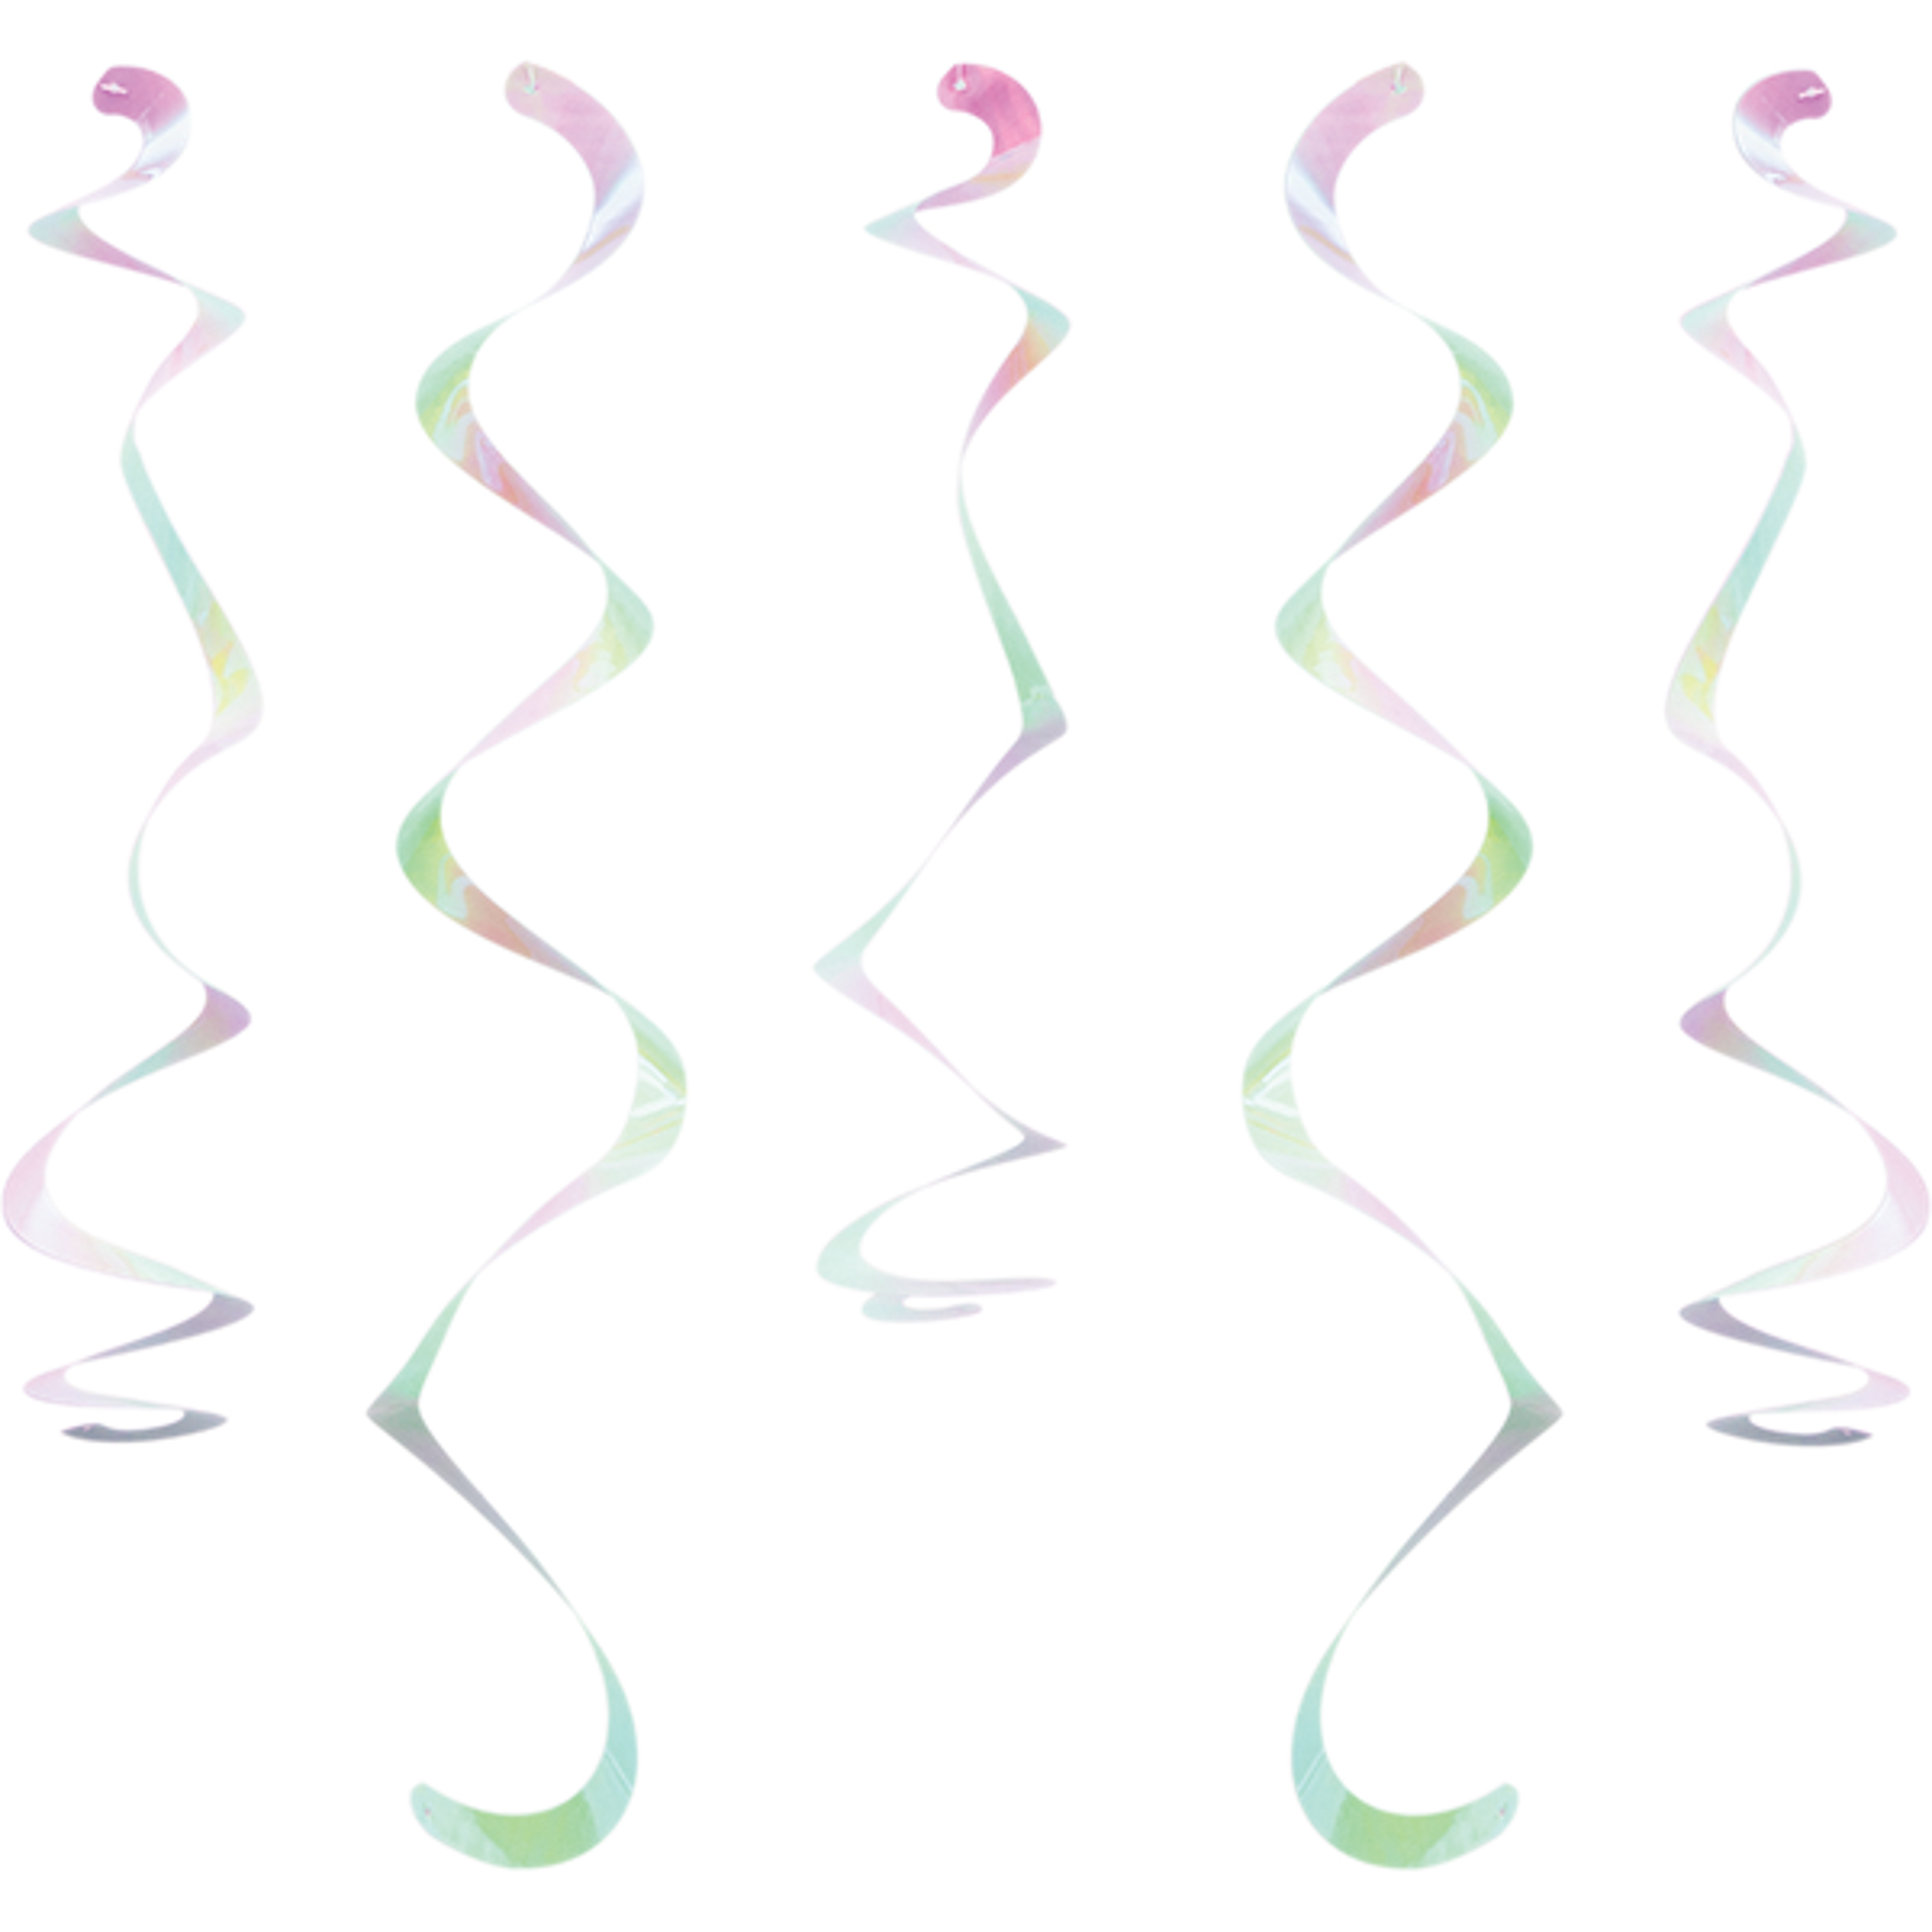 Iridescent Foil Dizzy Danglers Hanging Swirls